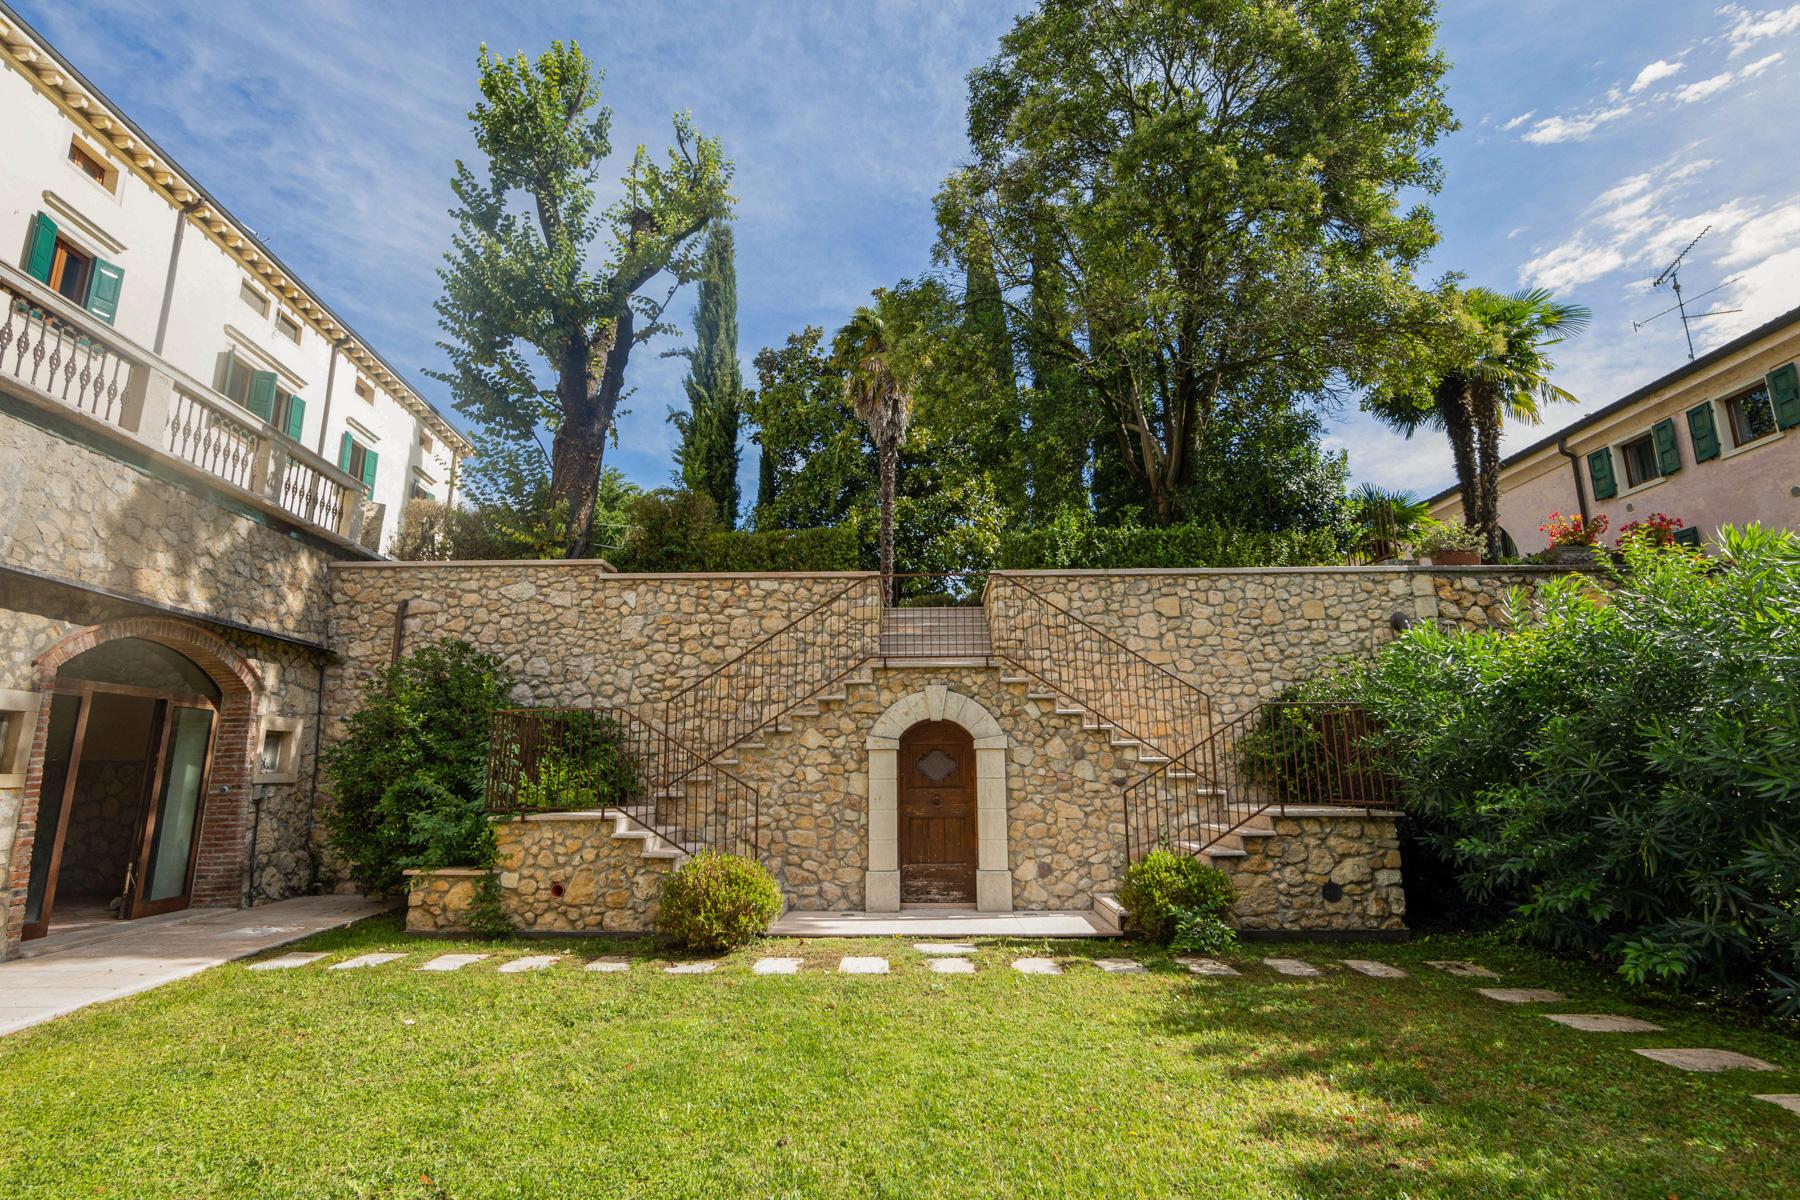 Villa in Vendita a Verona: 5 locali, 890 mq - Foto 3